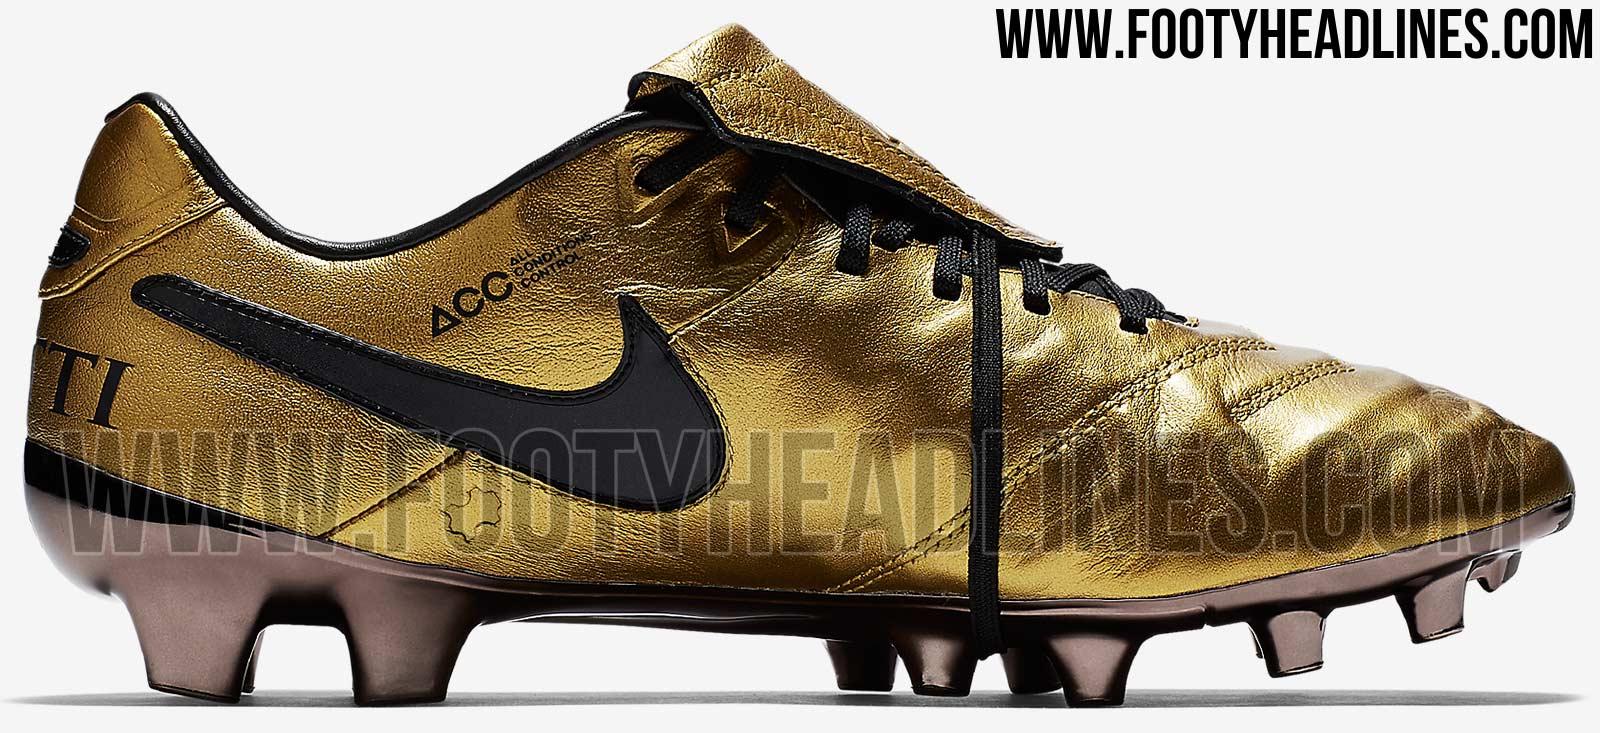 Edition X 331031 8 Nike Totti Boots Pagine Roma Limited Tiempo TaqZZ